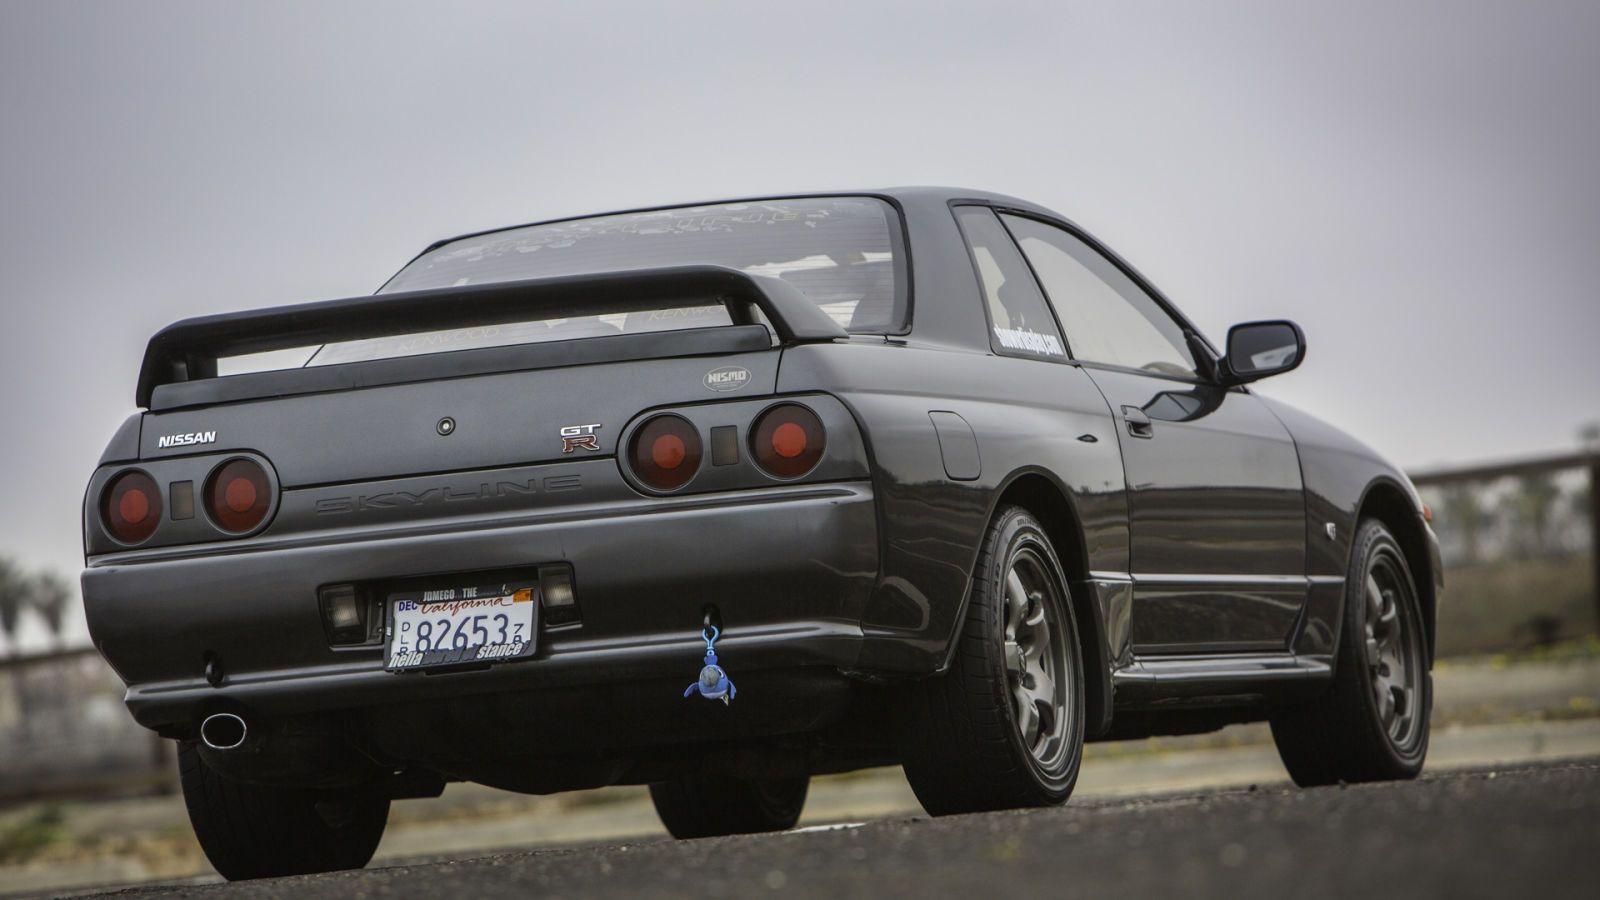 1990 nissan nismo skyline gt-r r32 import